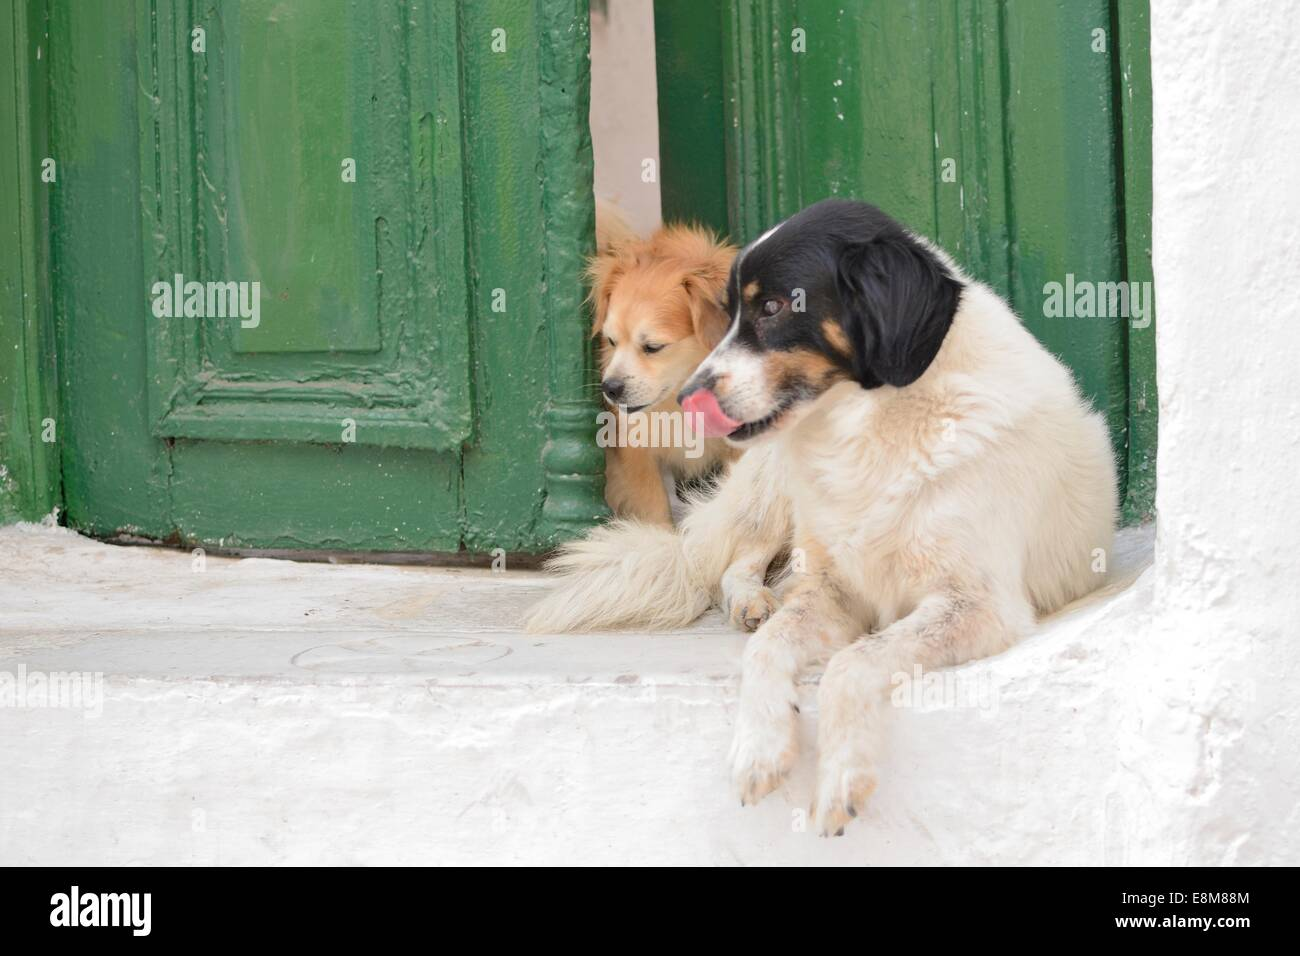 Curious Dogs looking around doorway - Stock Image